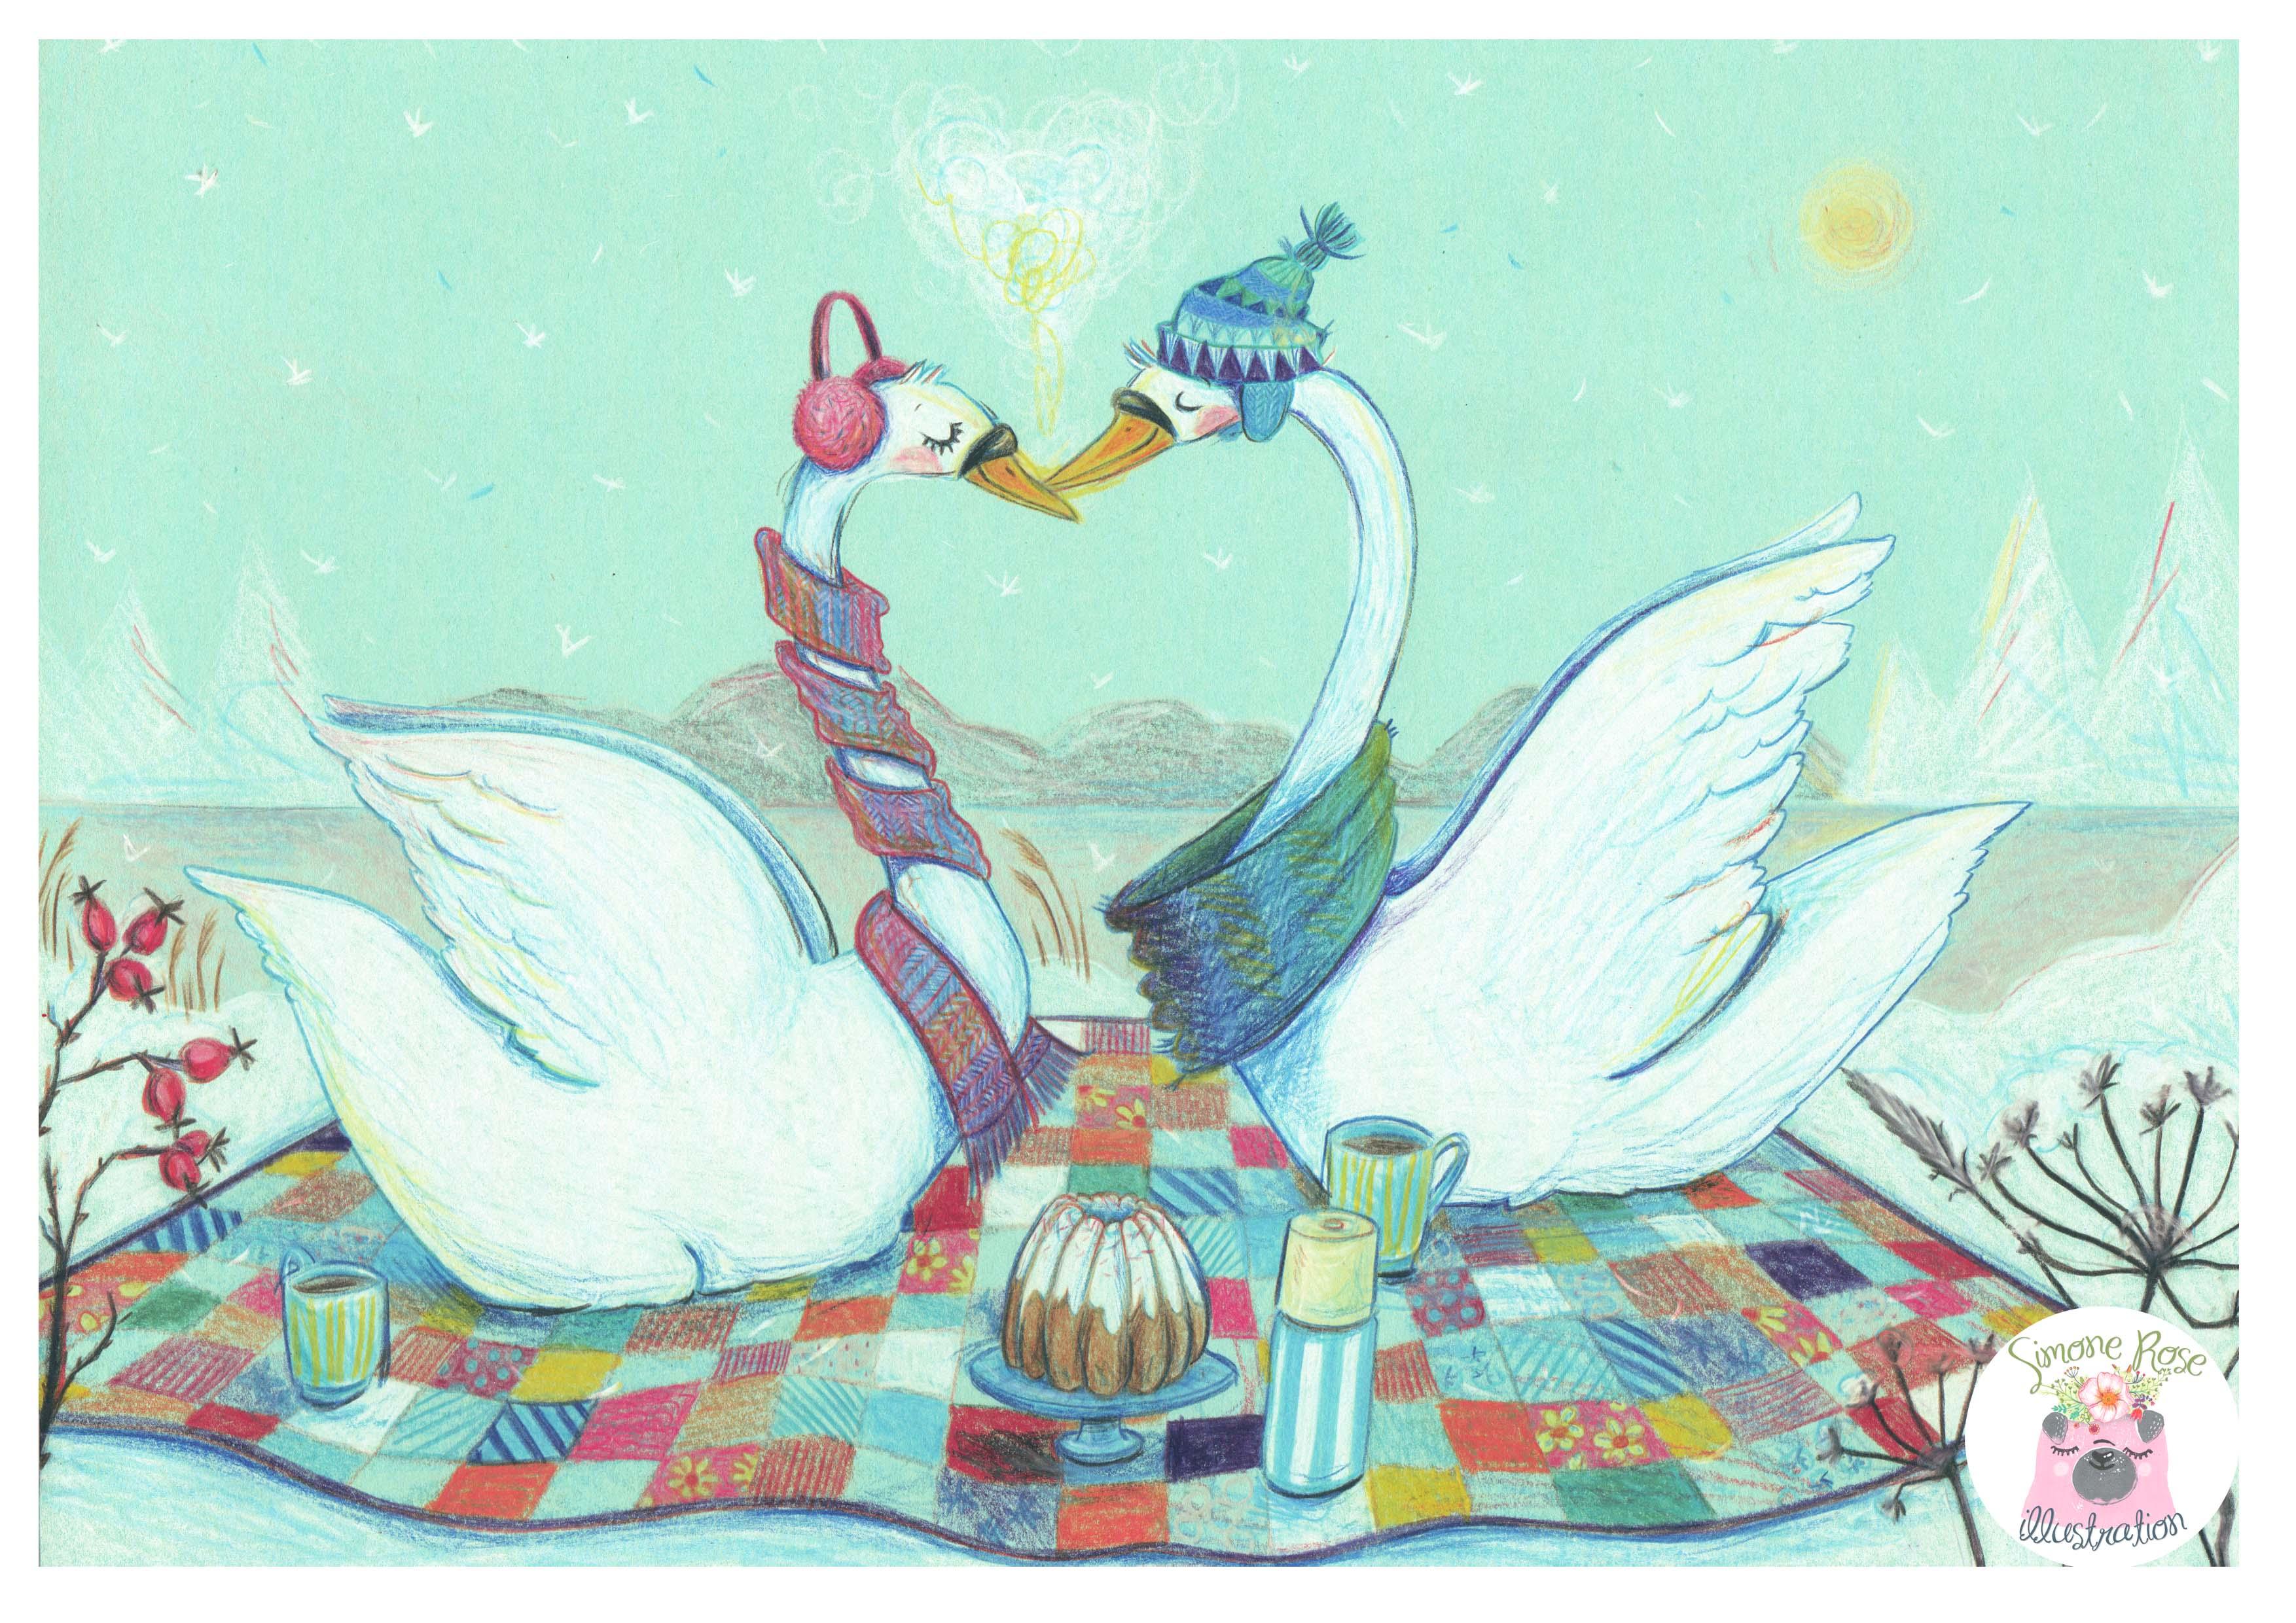 Aquarellbuntstift, Buntstiftillustration, Simone Rose Illustration, Kinderbuch, Kinder, Kinderbuchillustration, Illustratorin, Schwäne